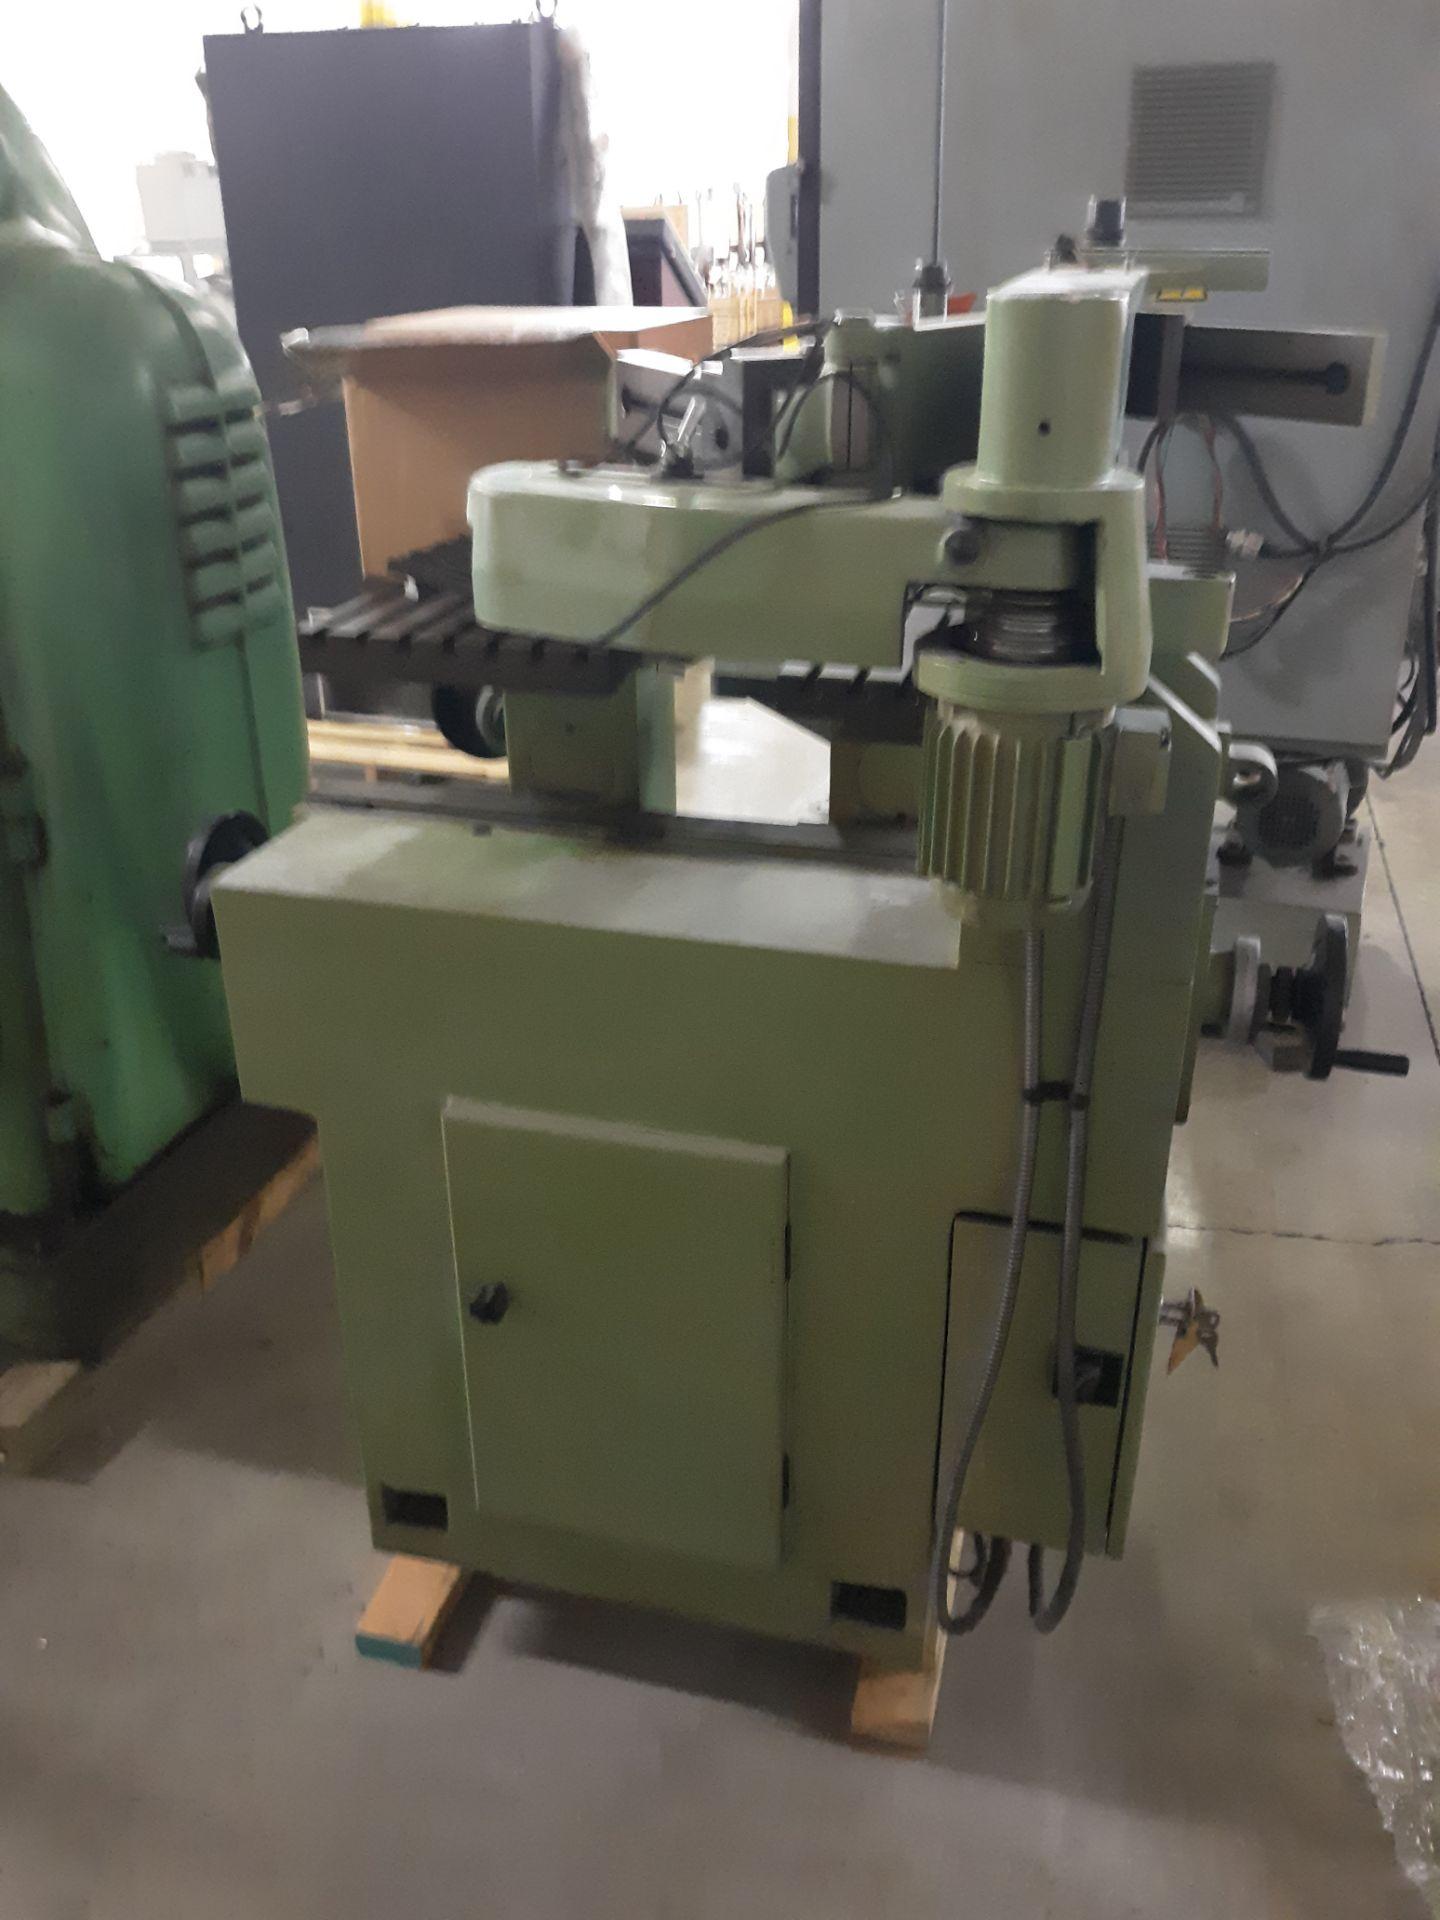 Lot 43 - BASIC MACHINE TOOLS ENGRAVER W/ CHARACTORS MACHINE W/INSERT PATTERNS; RIGGING FEE: $10